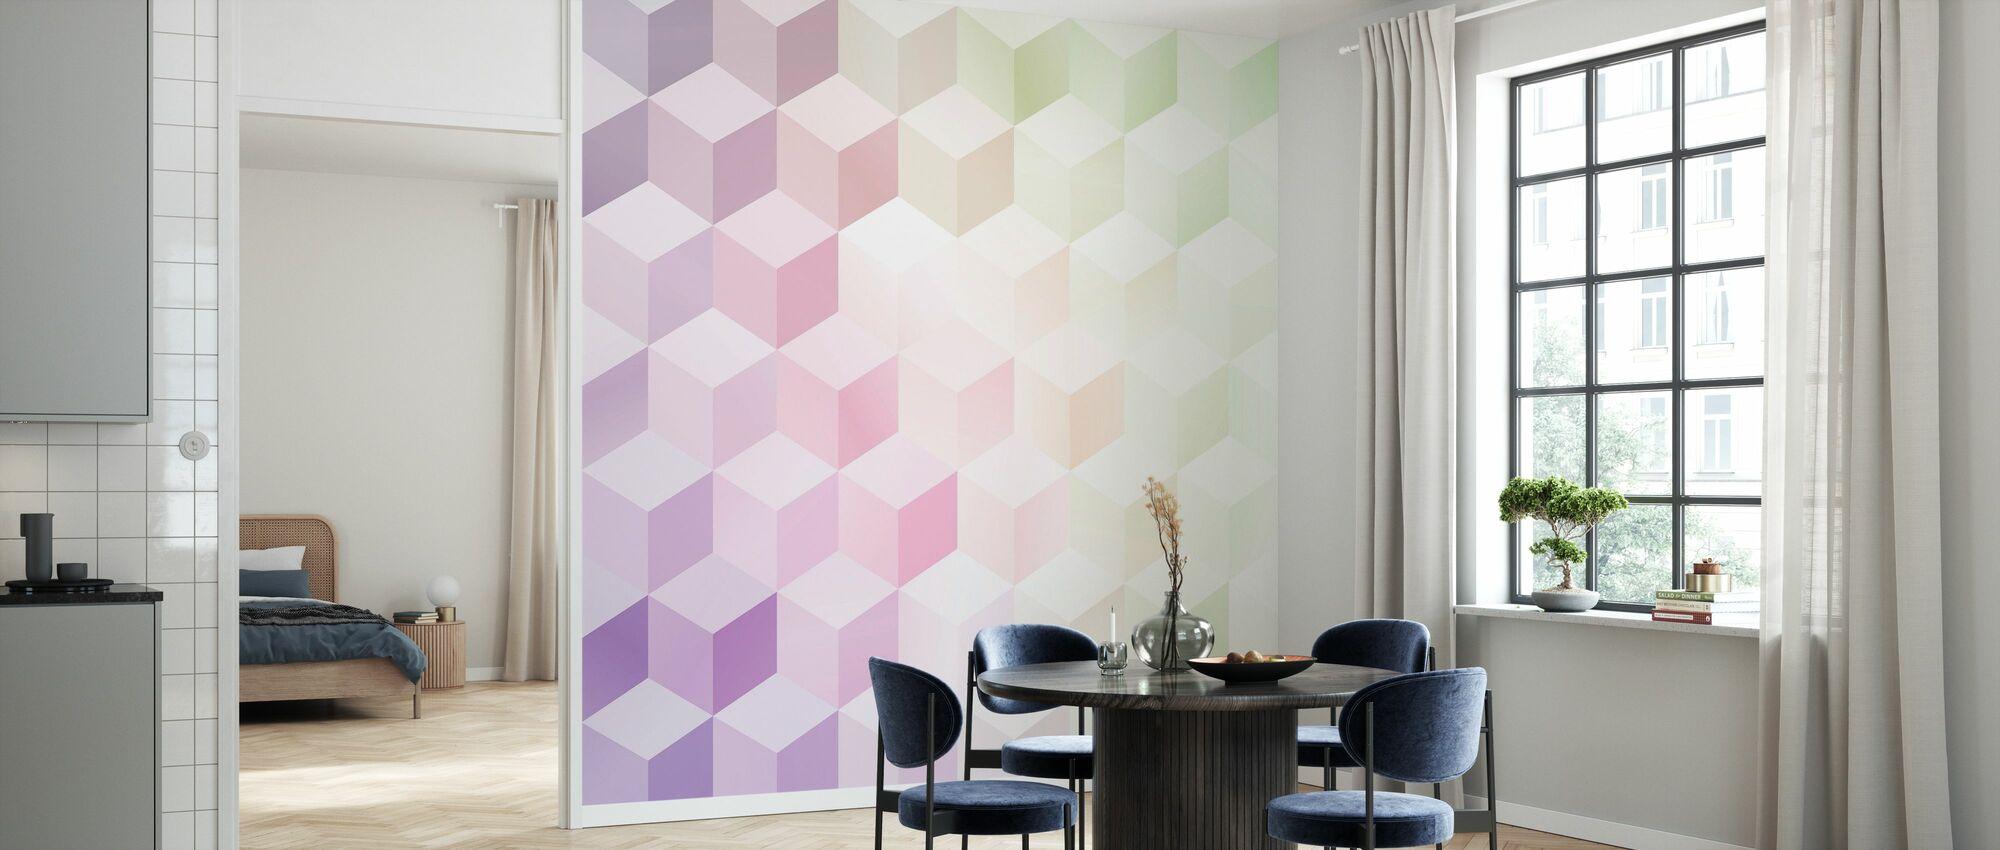 Cubes in Frosty Pastel - Wallpaper - Kitchen